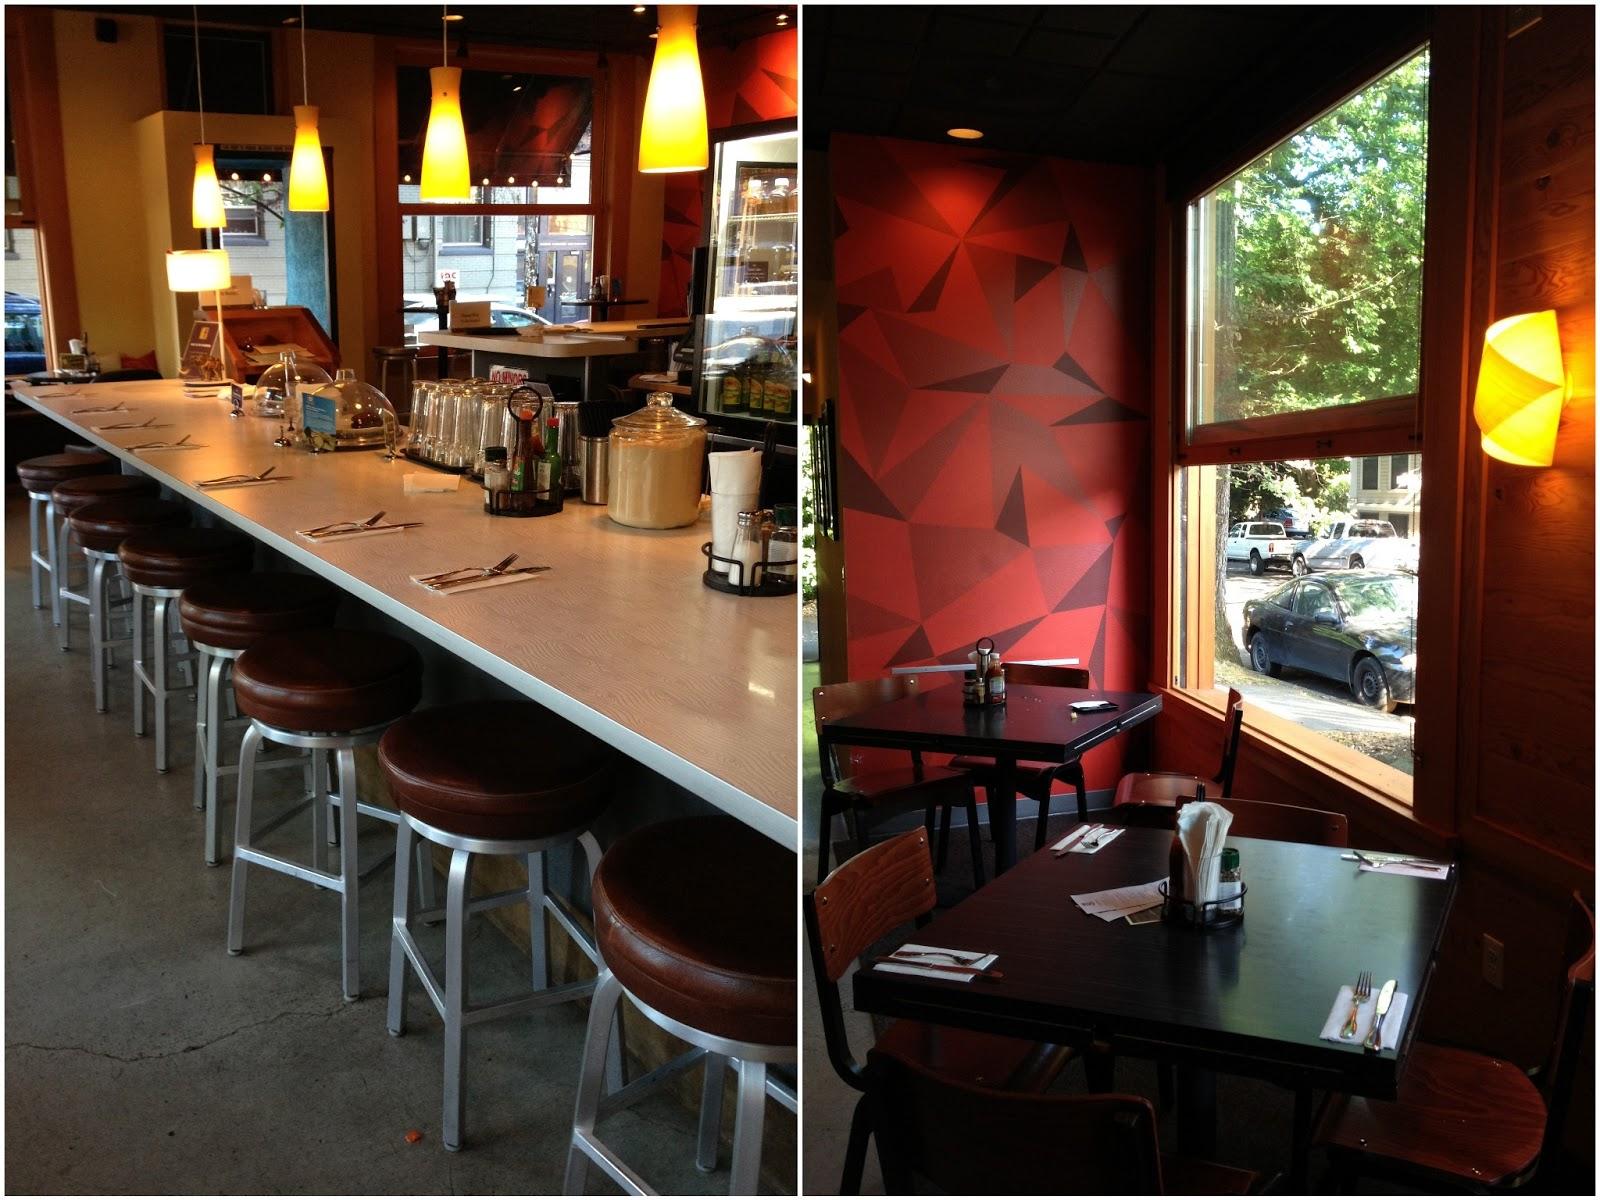 Grassfed geek trip to dick 39 s kitchen for grassfed burgers for Primal kitchen restaurant